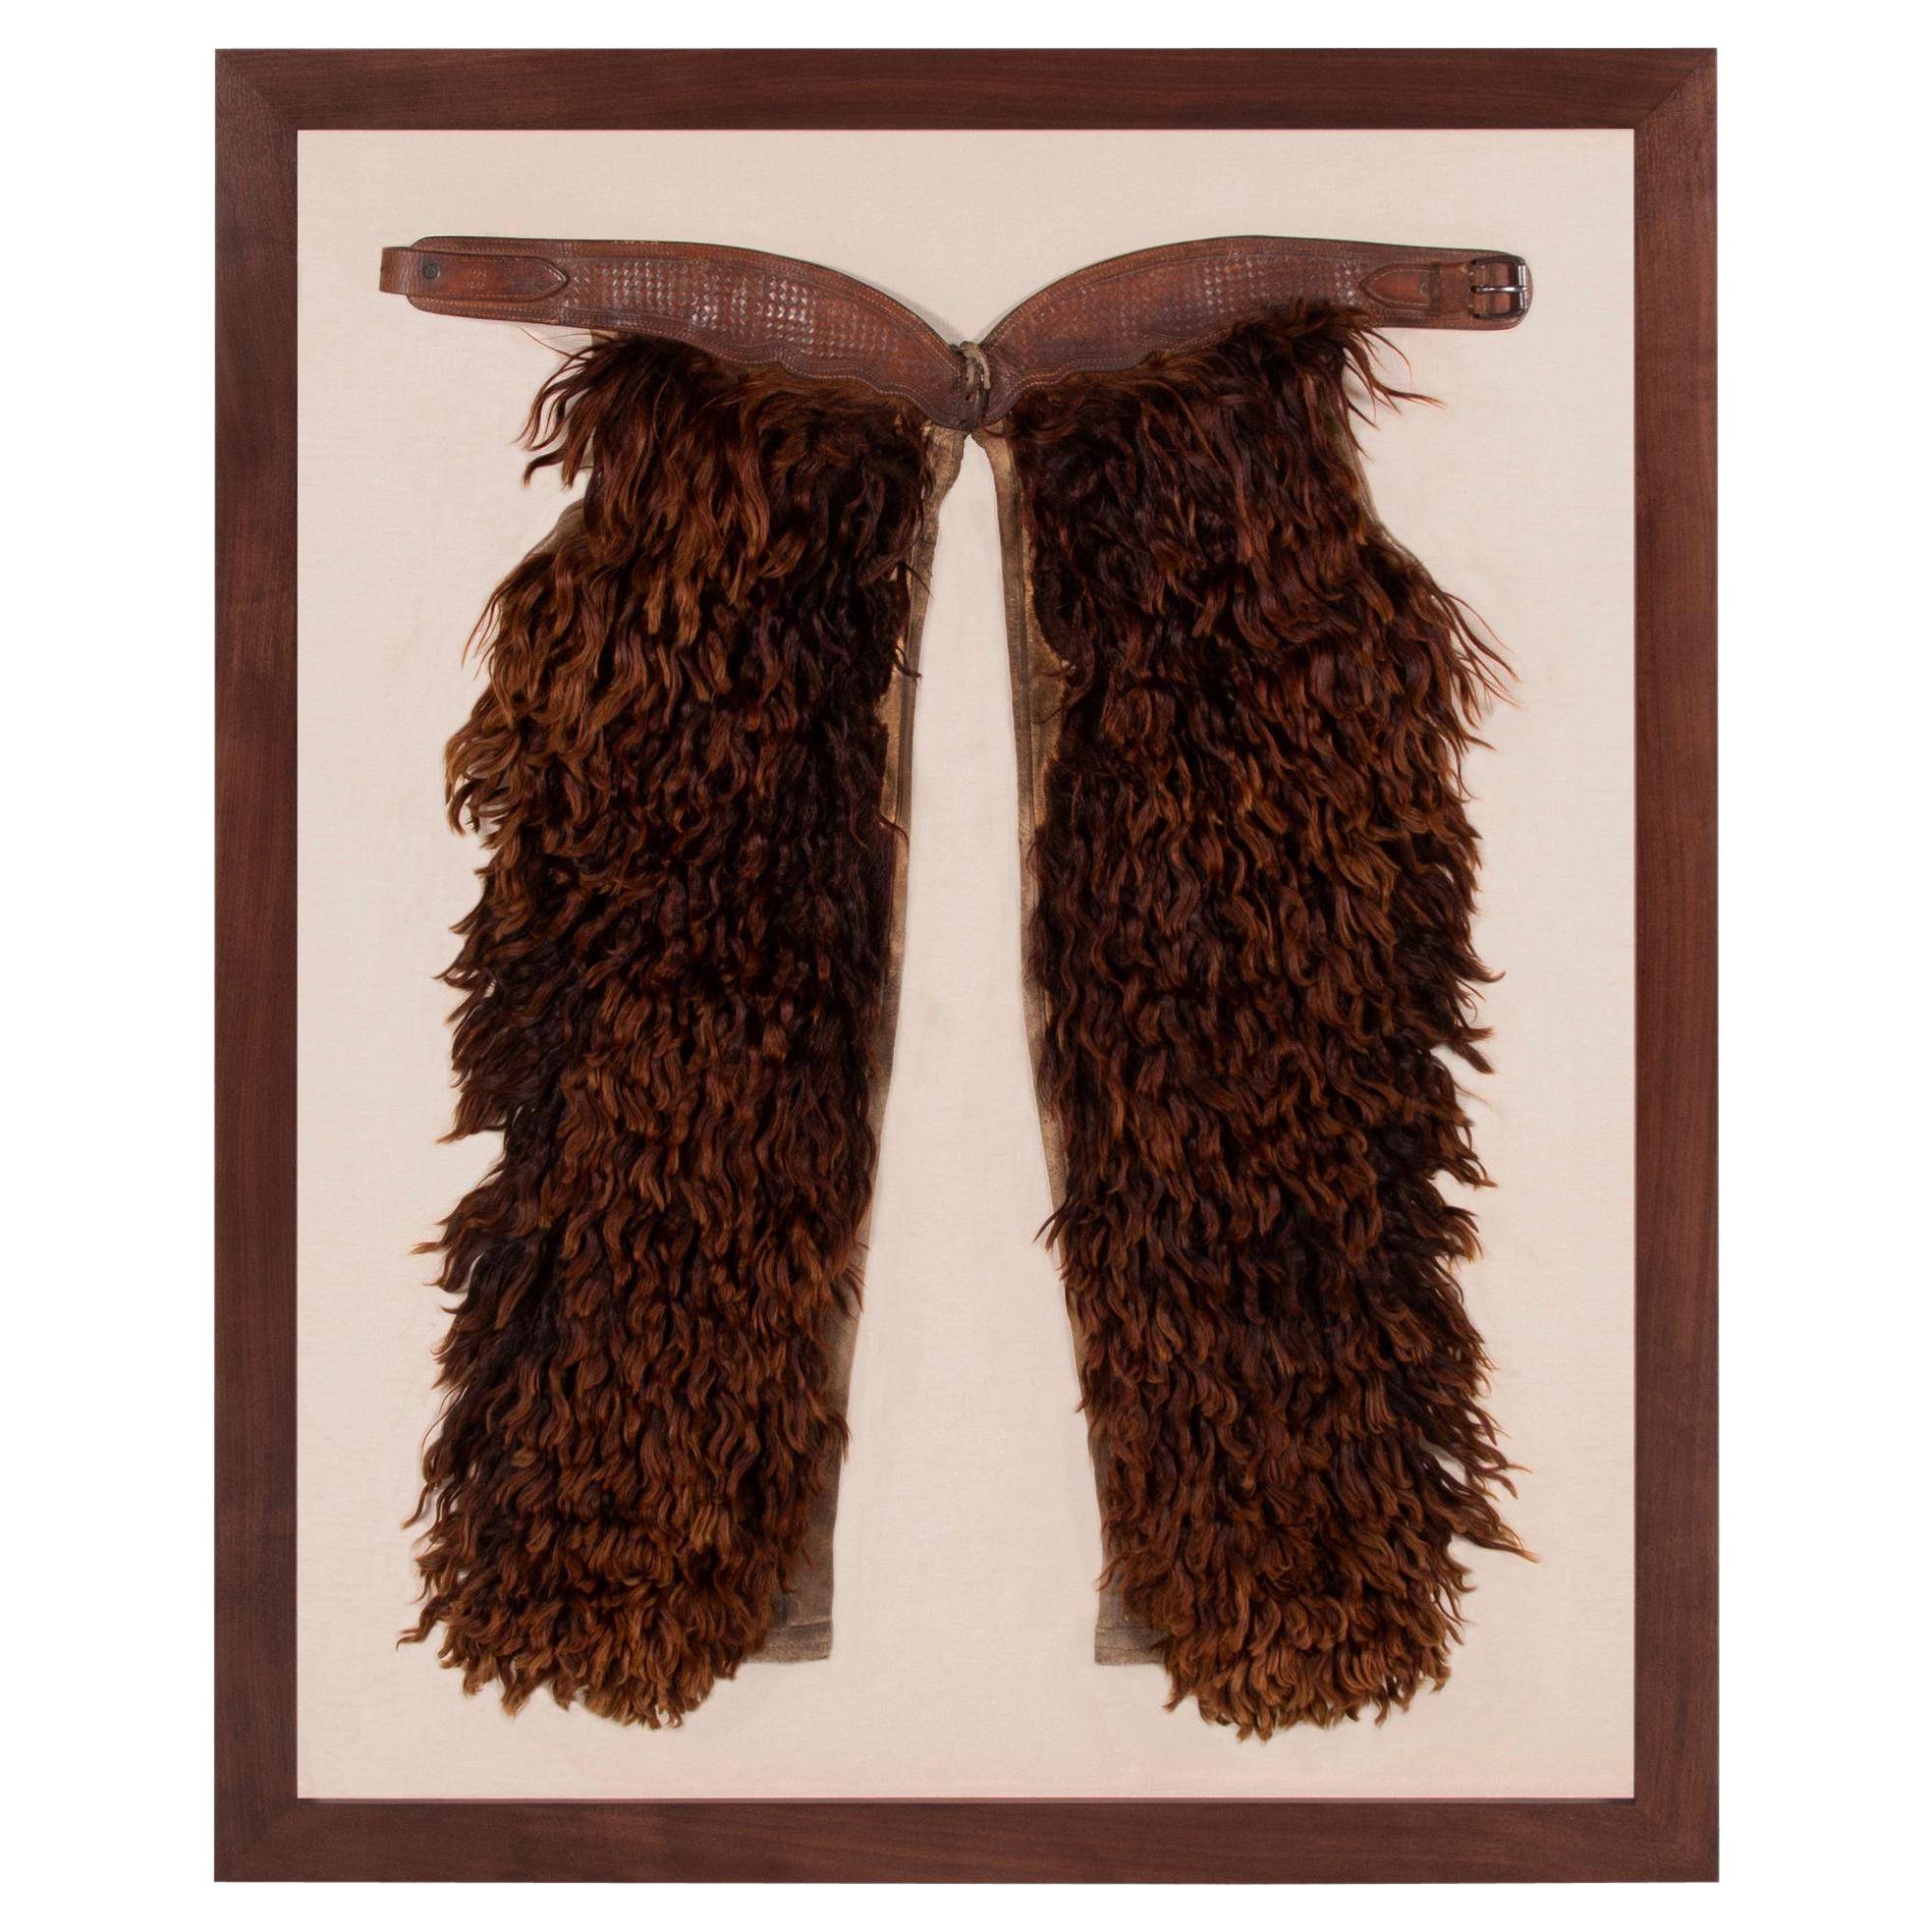 Wooly, Angora Chaps Made by John Clark Saddlery, Portland, Or, CA 1873-1929